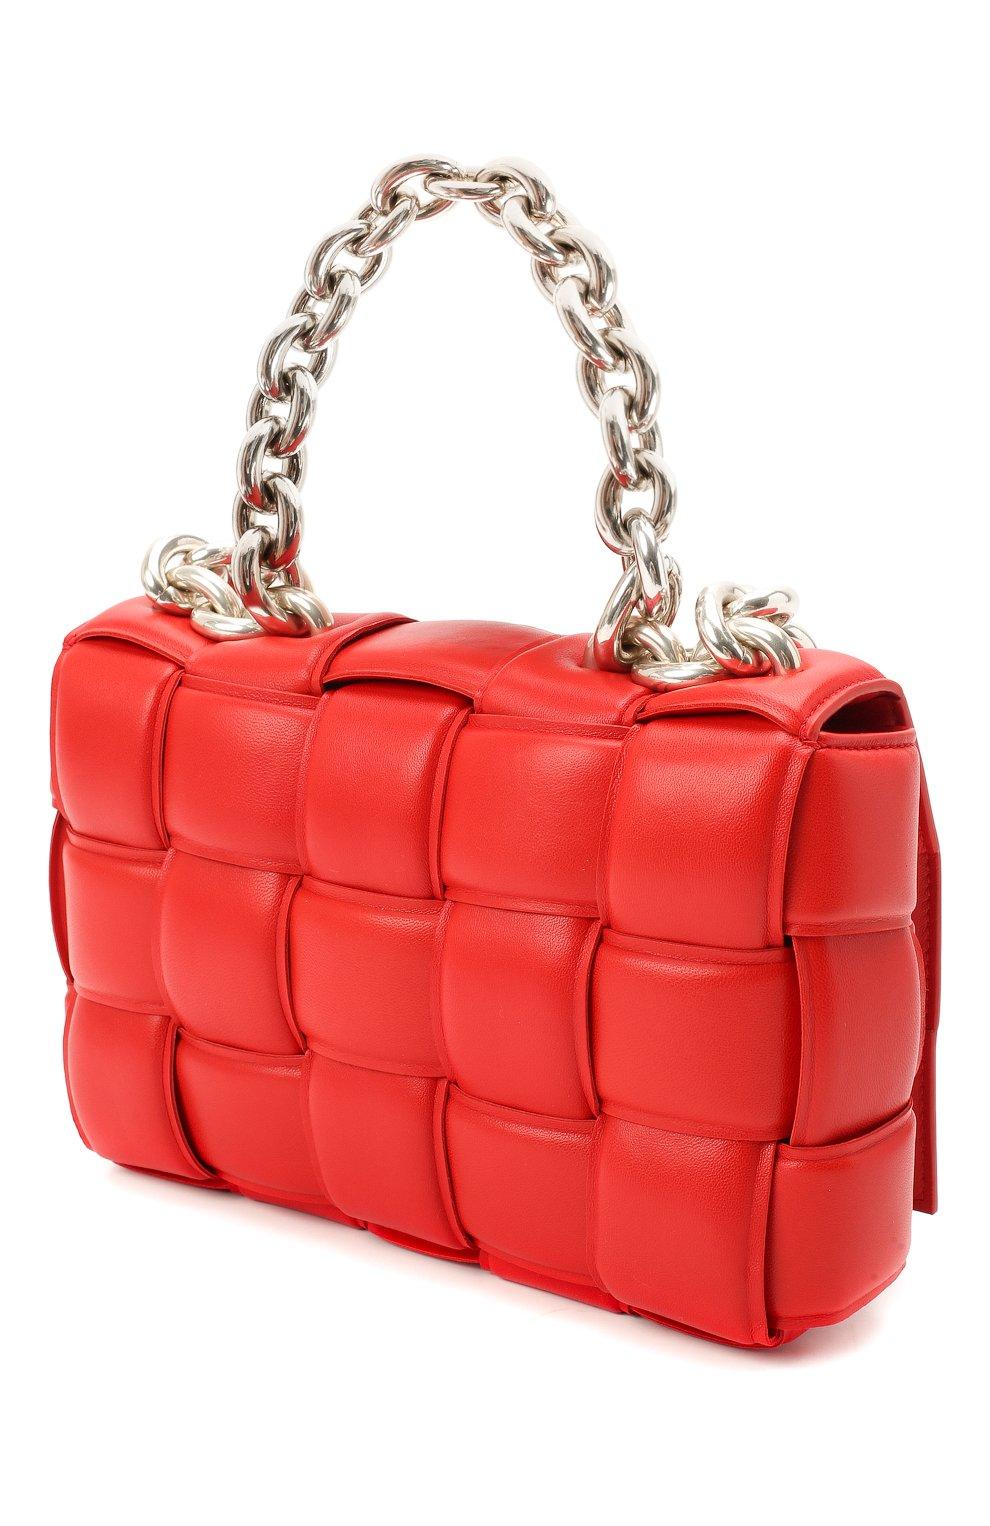 Женская сумка chain cassette BOTTEGA VENETA красного цвета, арт. 631421/VBWZ0   Фото 3